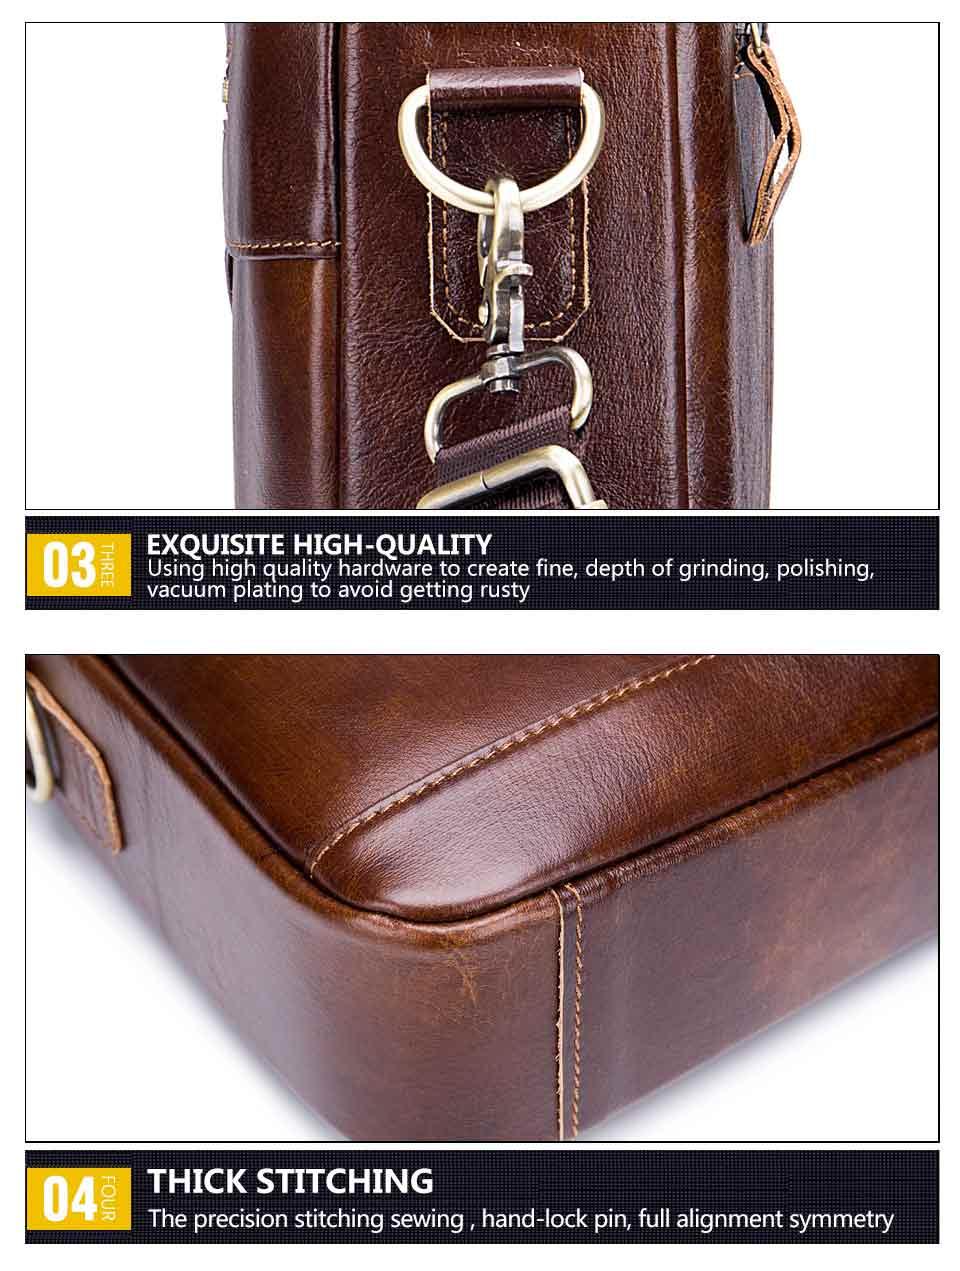 comercial pasta couro real do vintage mensageiro saco casual saco negócios